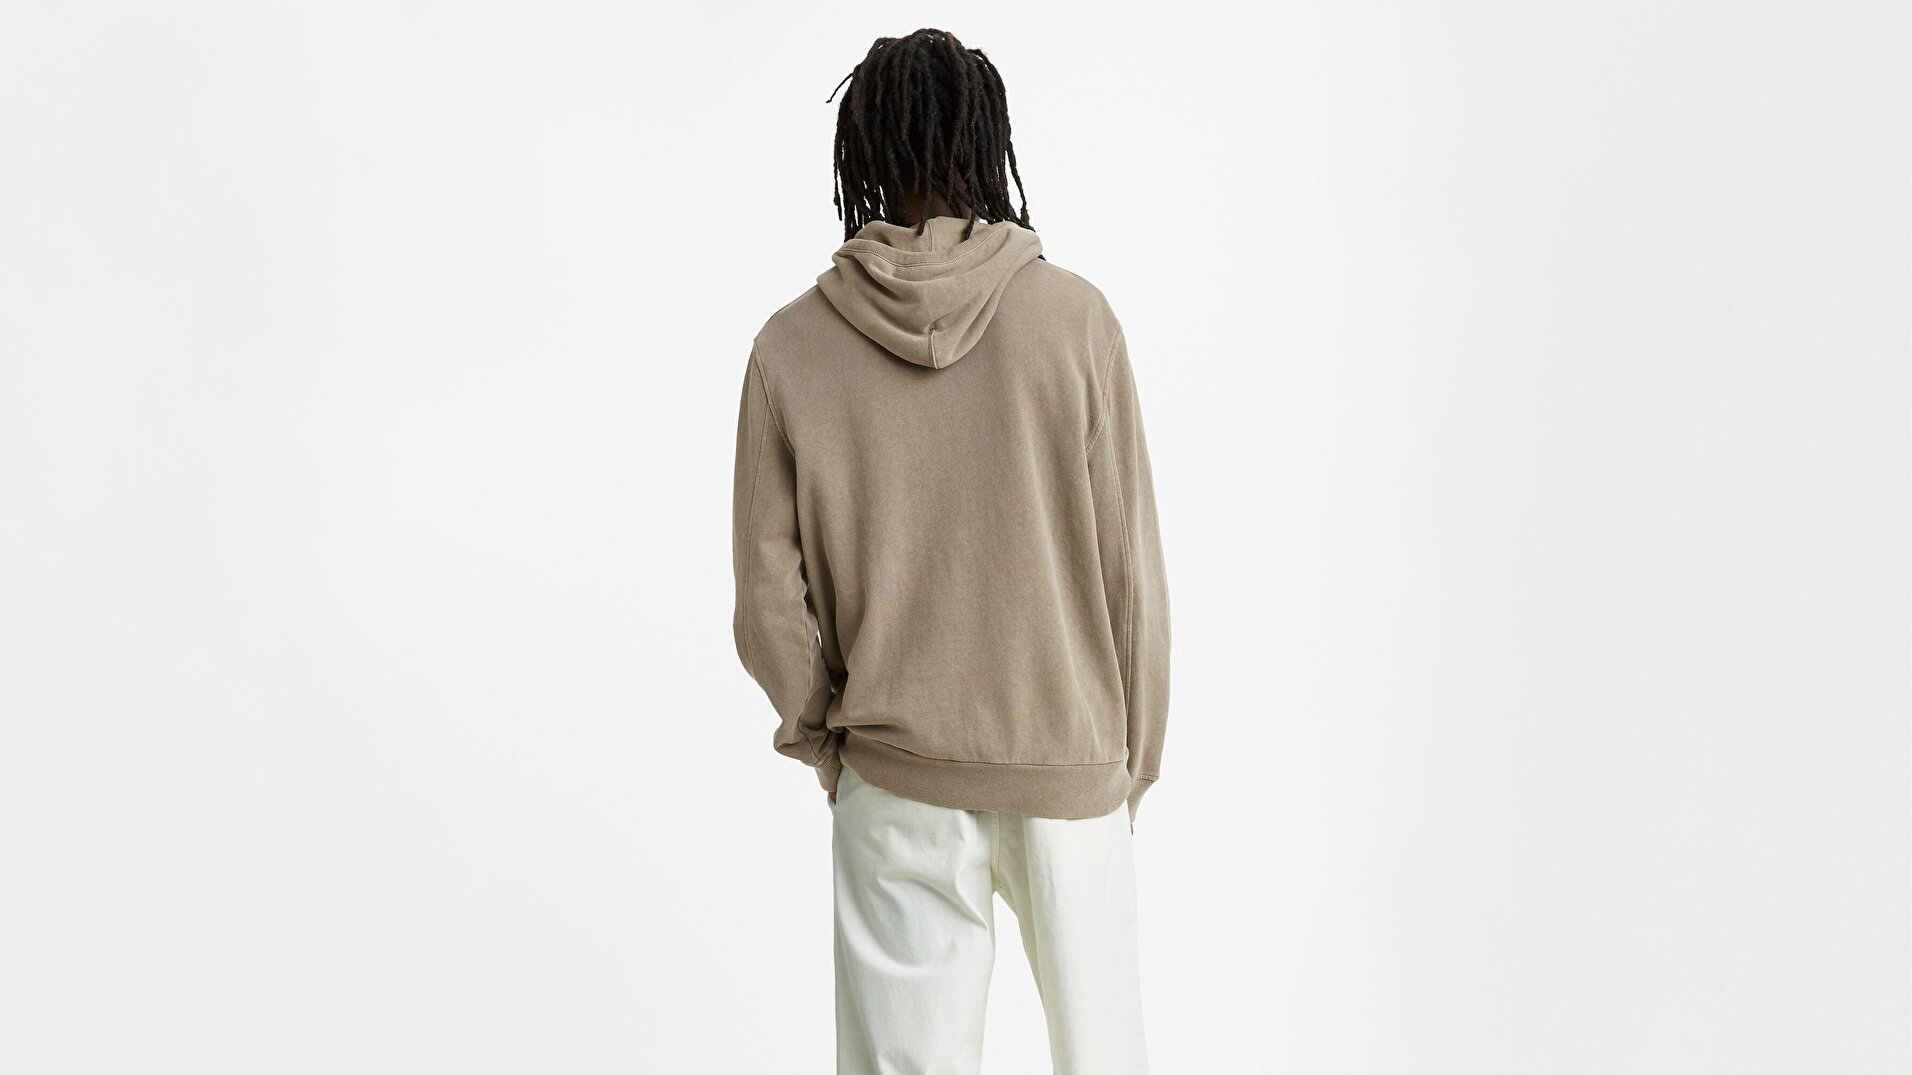 Wellthread Hoodie Clay Cotton Siyah Erkek Kapüşonlu Sweatshirt